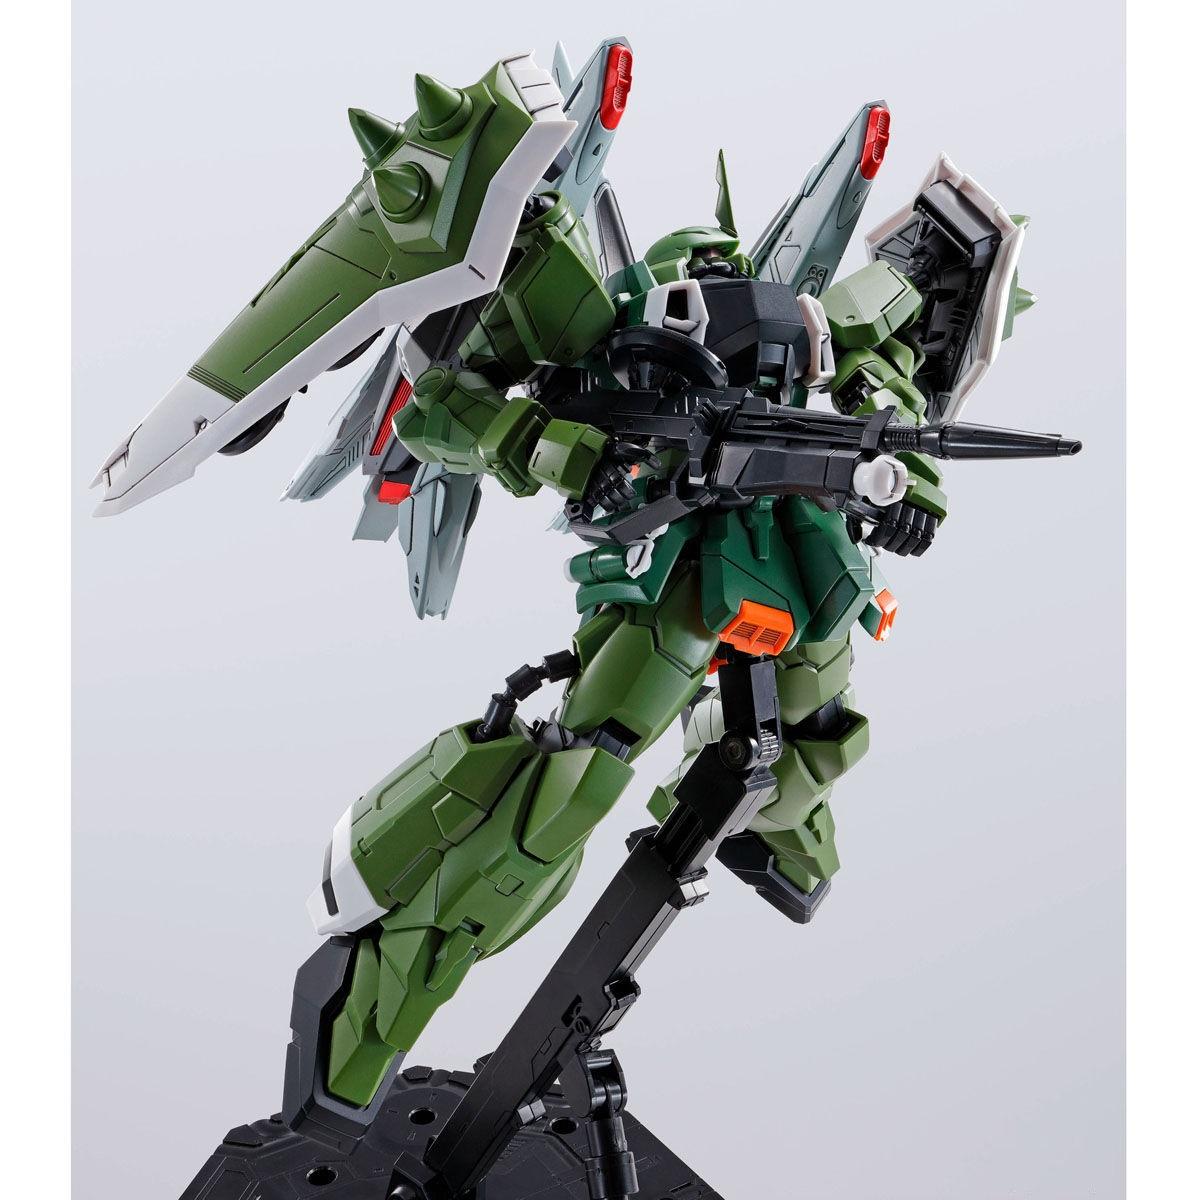 MG 1/100 BLAZE ZAKU PHANTOM / BLAZE ZAKU WARRIOR [2021年4月發送]